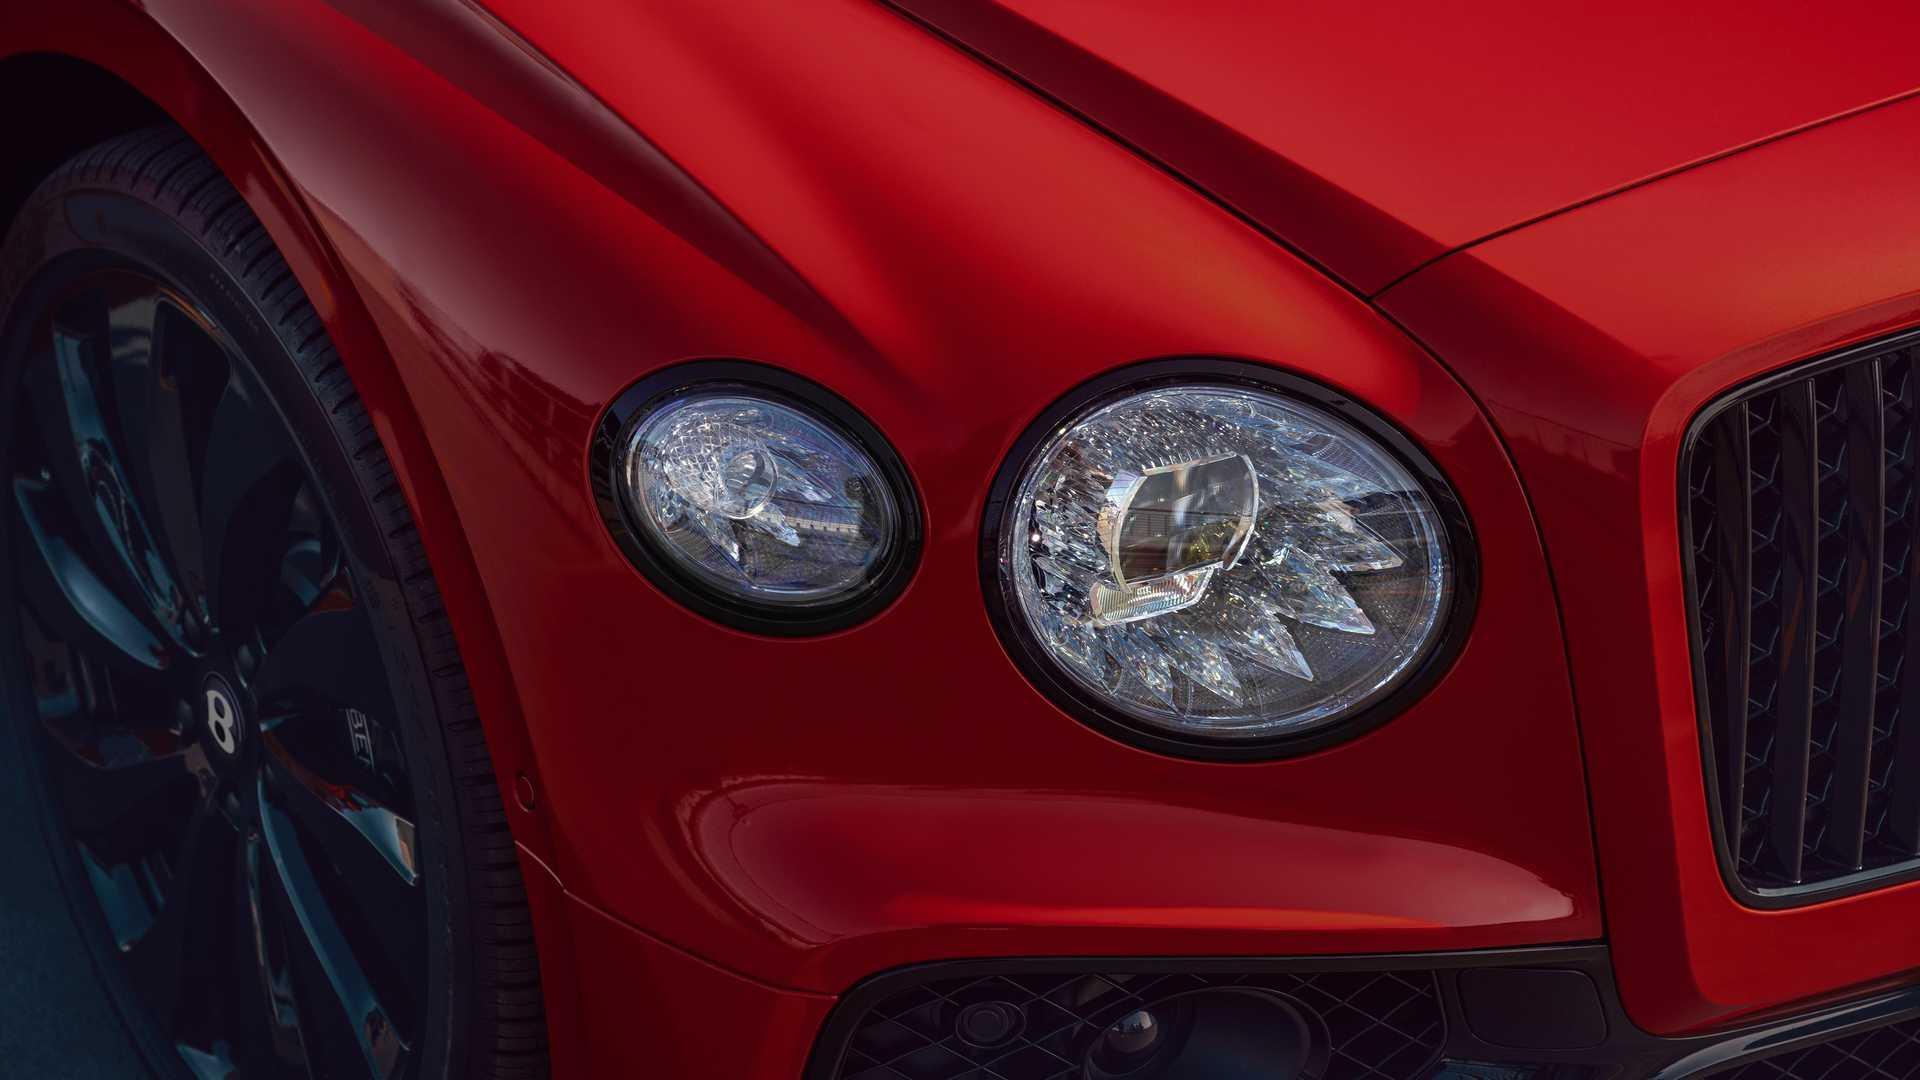 bentley-flying-spur-v8-headlights.jpg